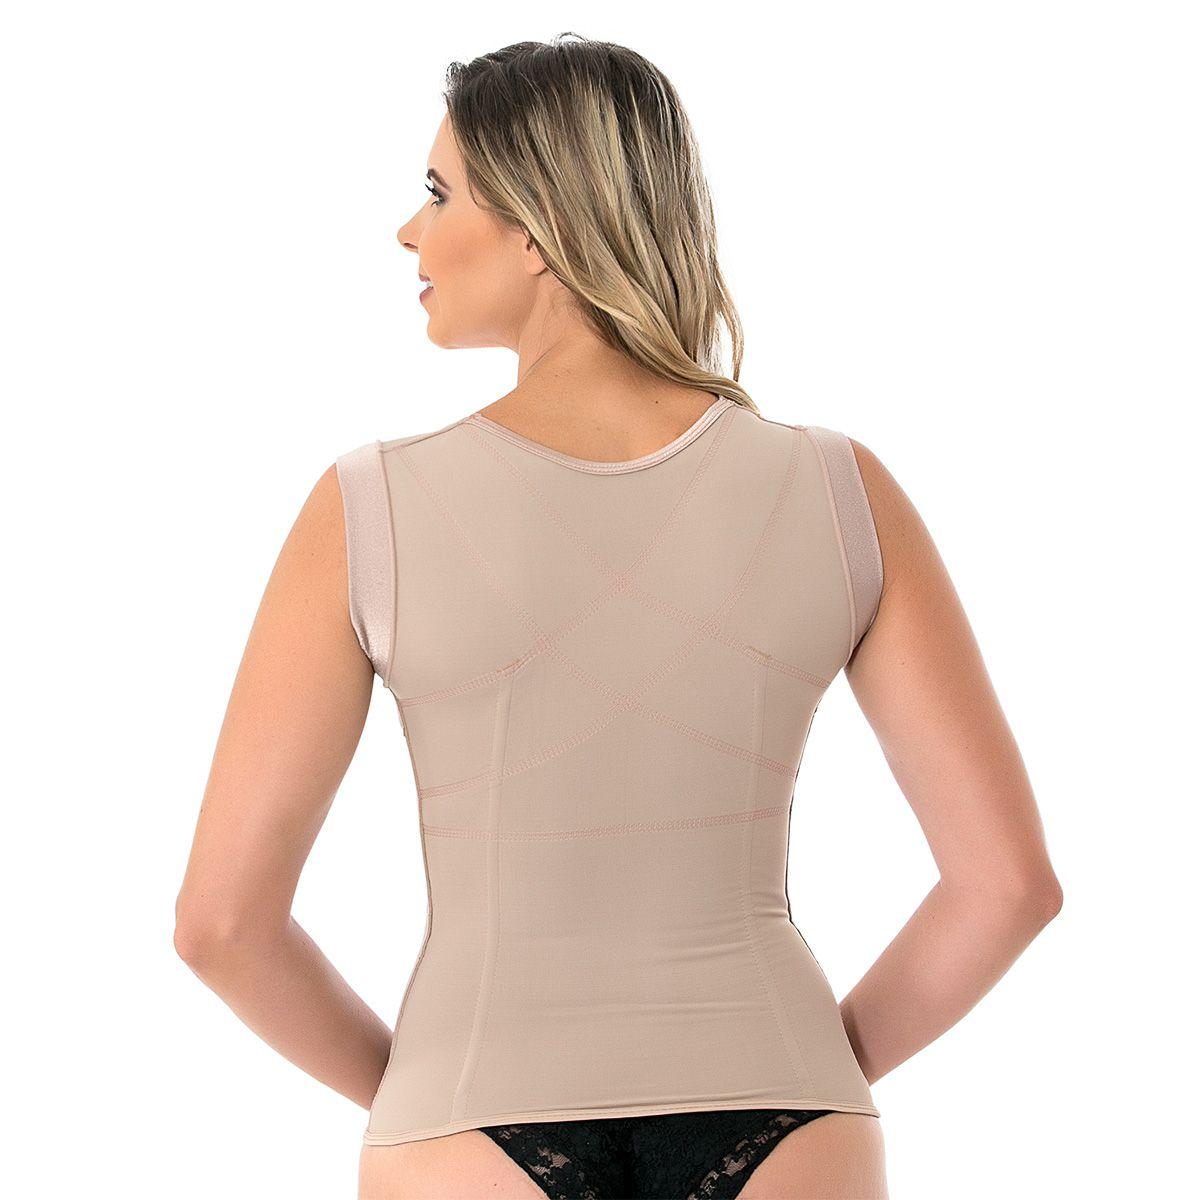 Corretor postural feminino Mabella 1029 215 c/ reforço costas, alça larga, barbatanas s busto